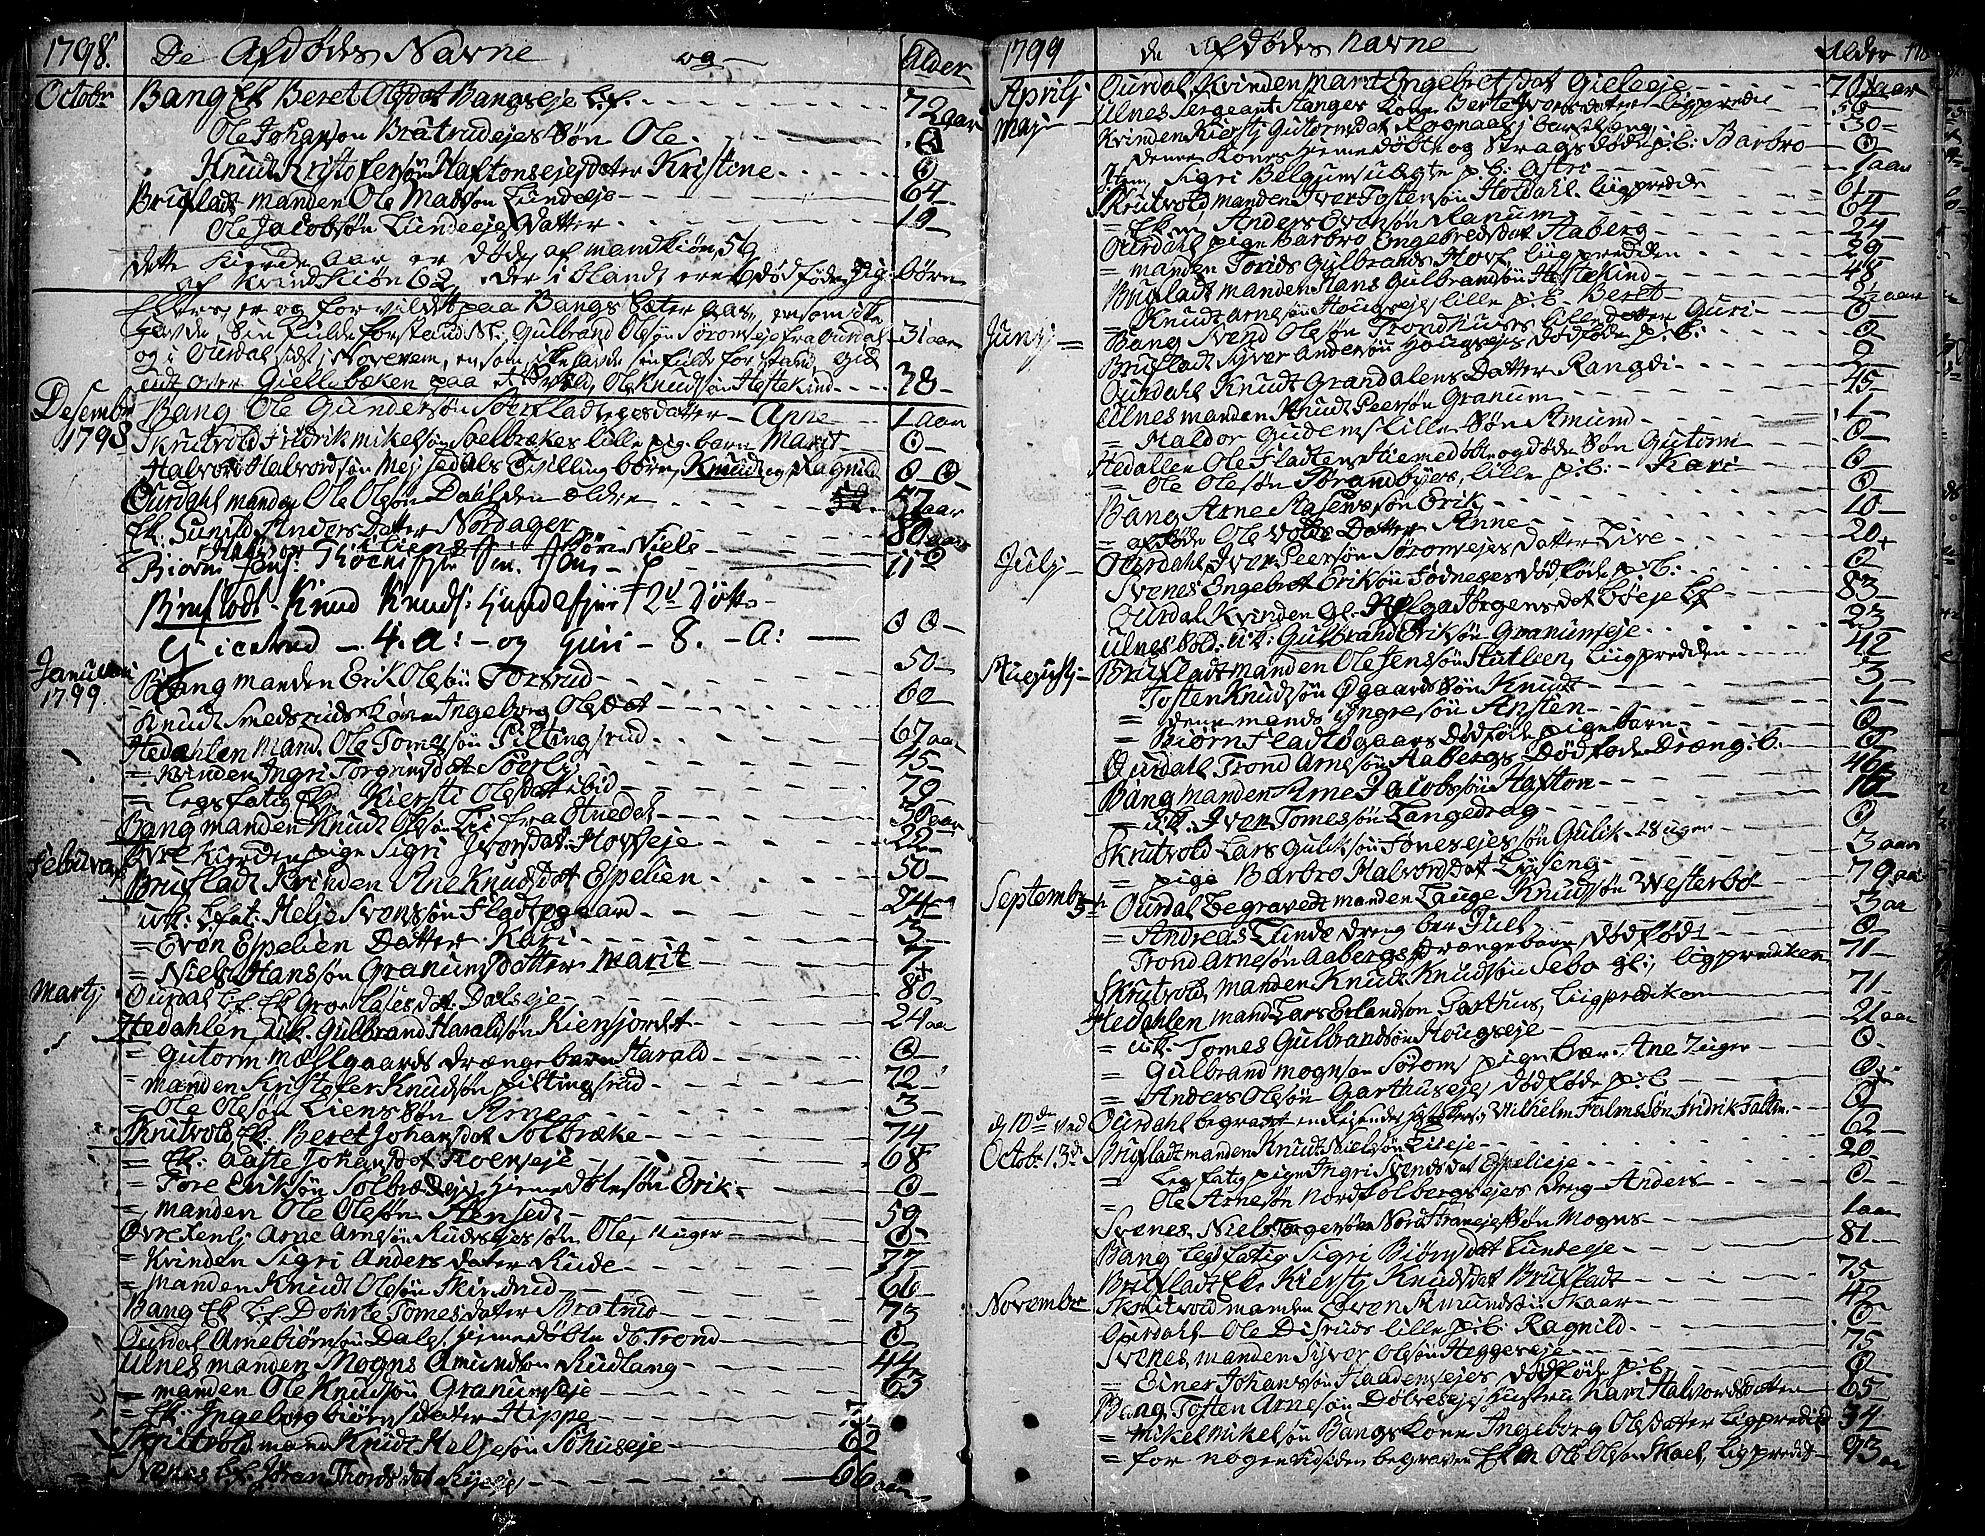 SAH, Aurdal prestekontor, Ministerialbok nr. 6, 1781-1804, s. 178